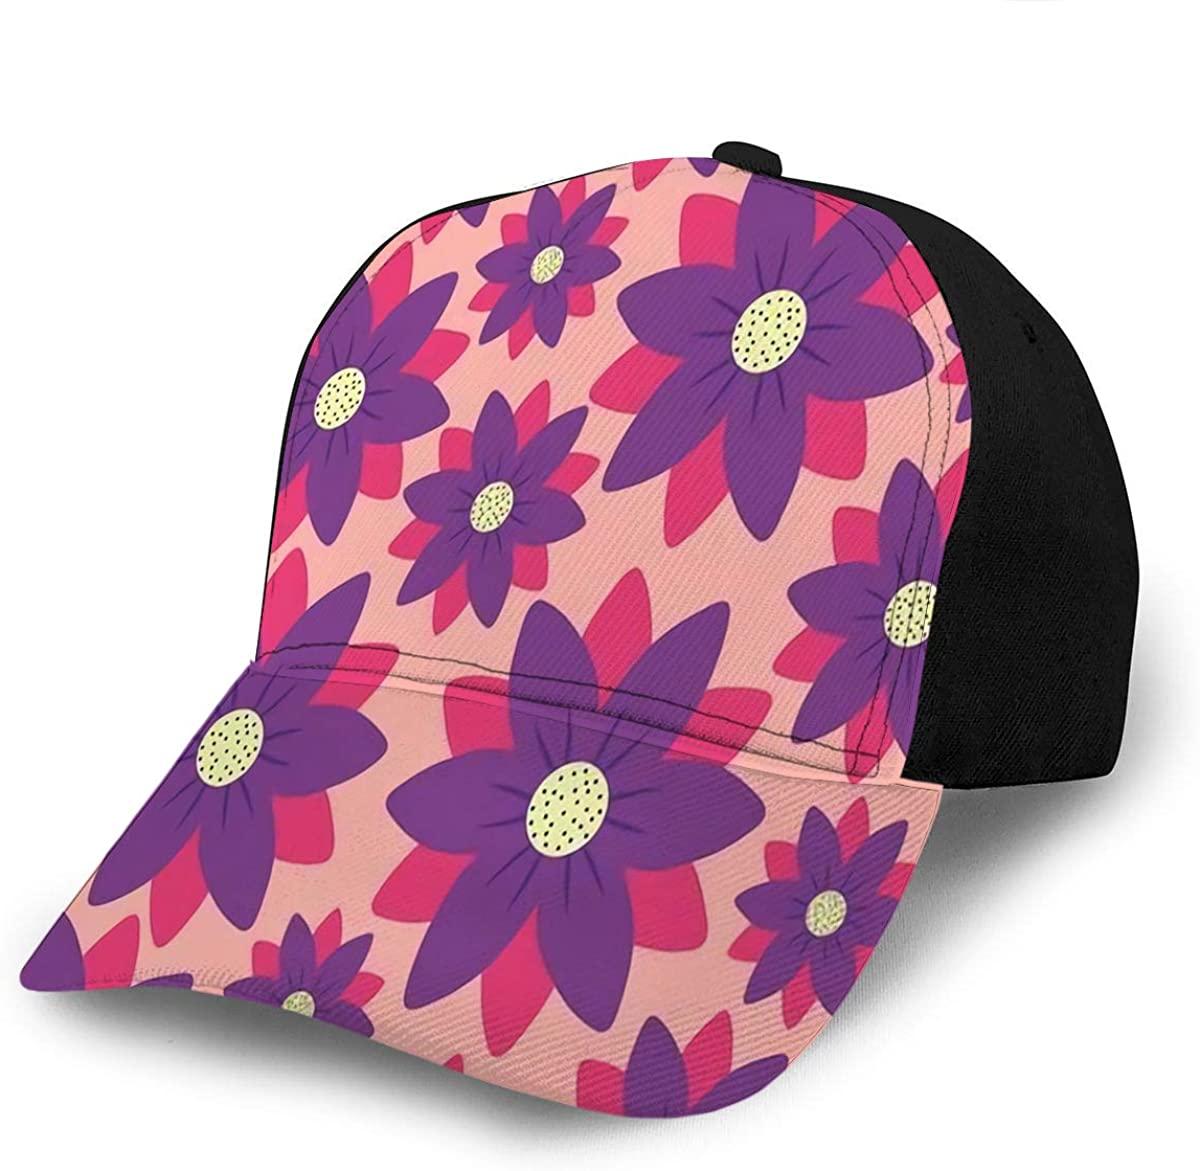 YILINGER Baseball Caps Hats Beautiful Flowers Colorful Design Cowboy Caps